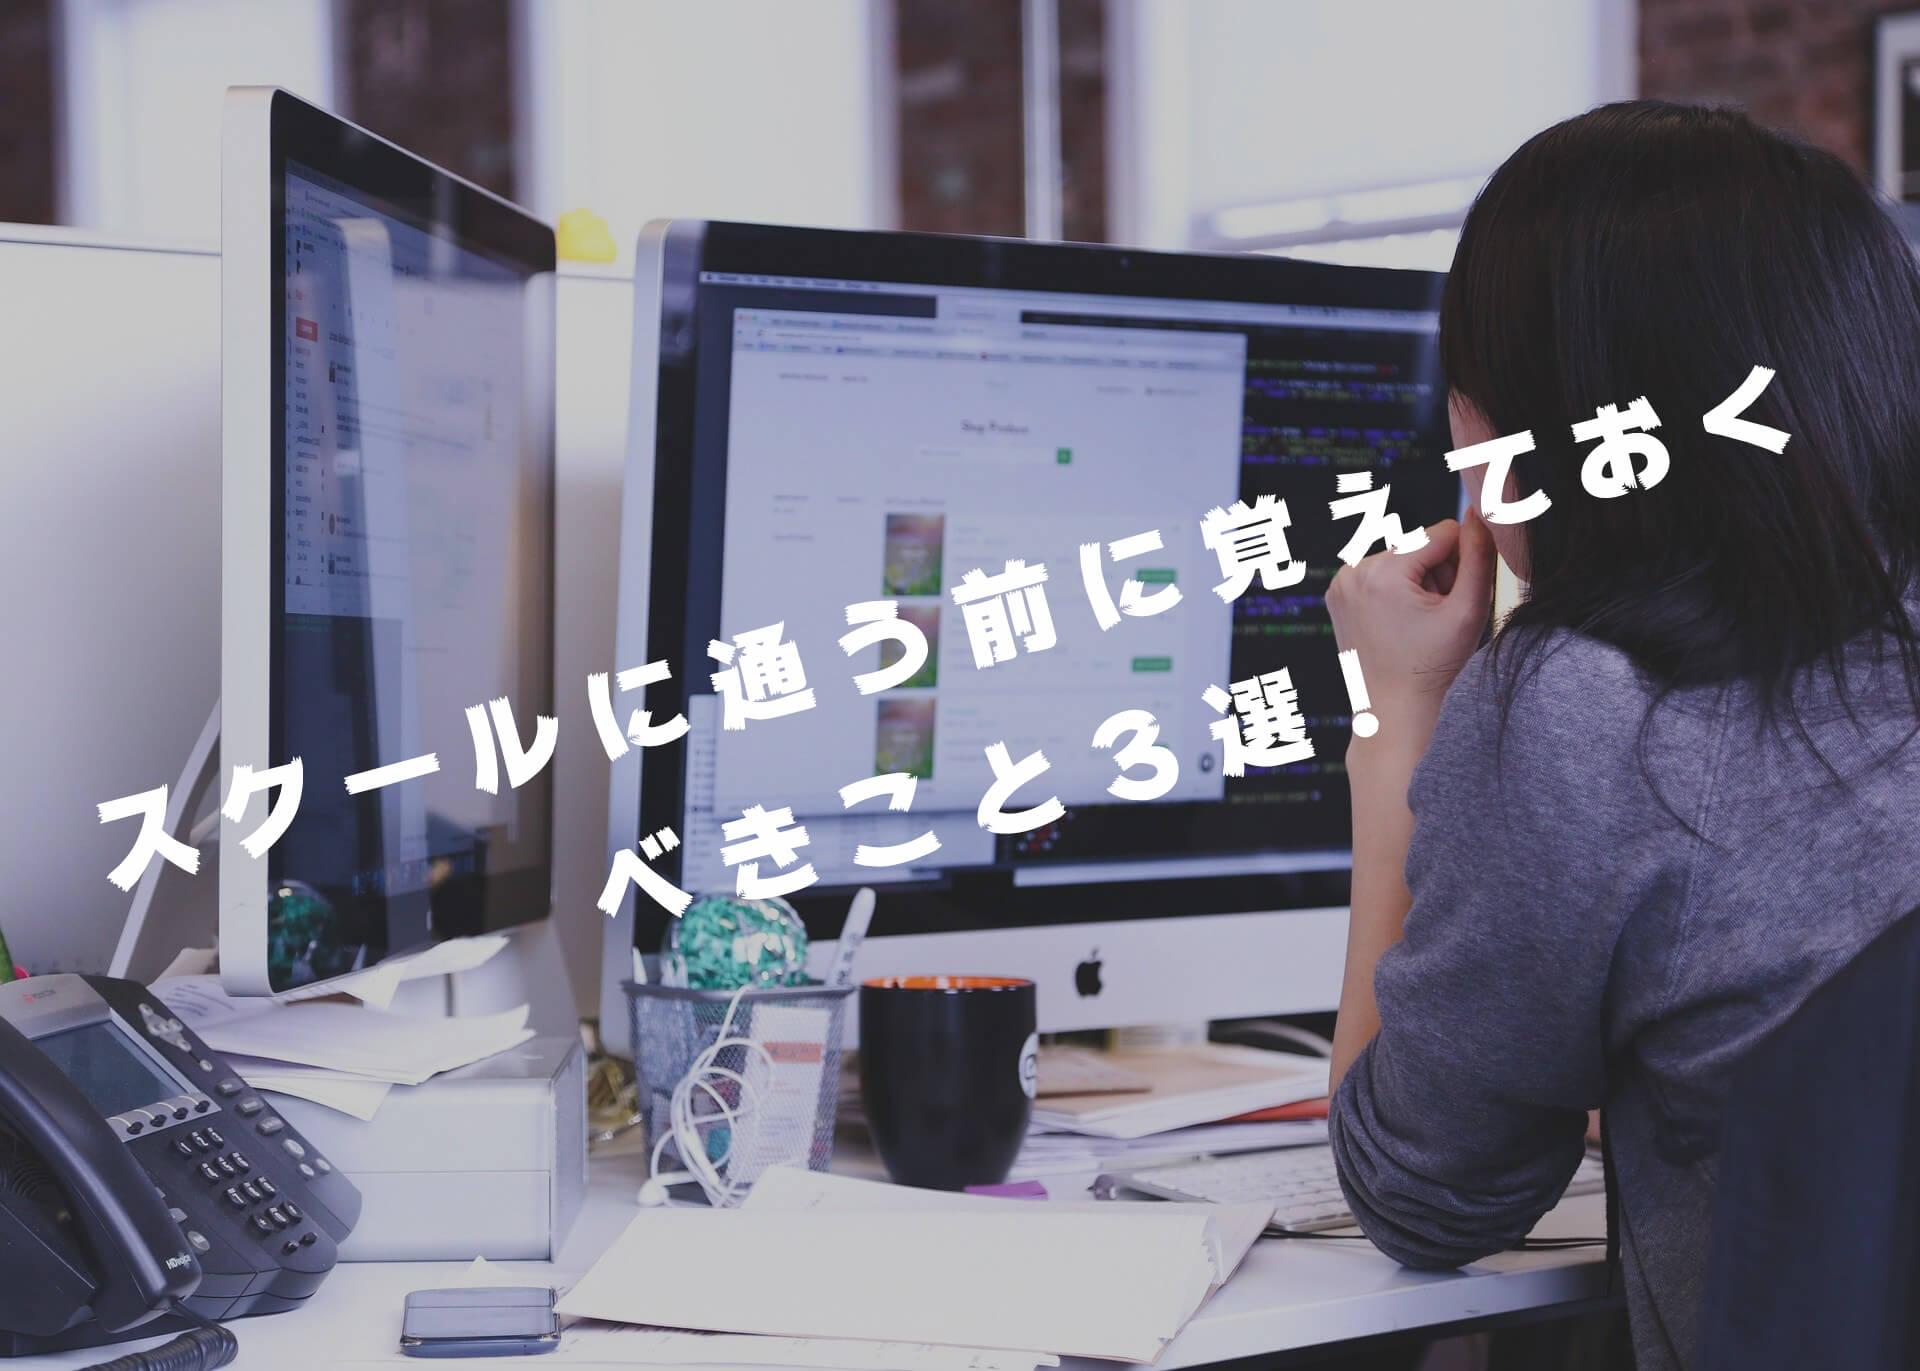 webデザイン、スクール、学ぶ3